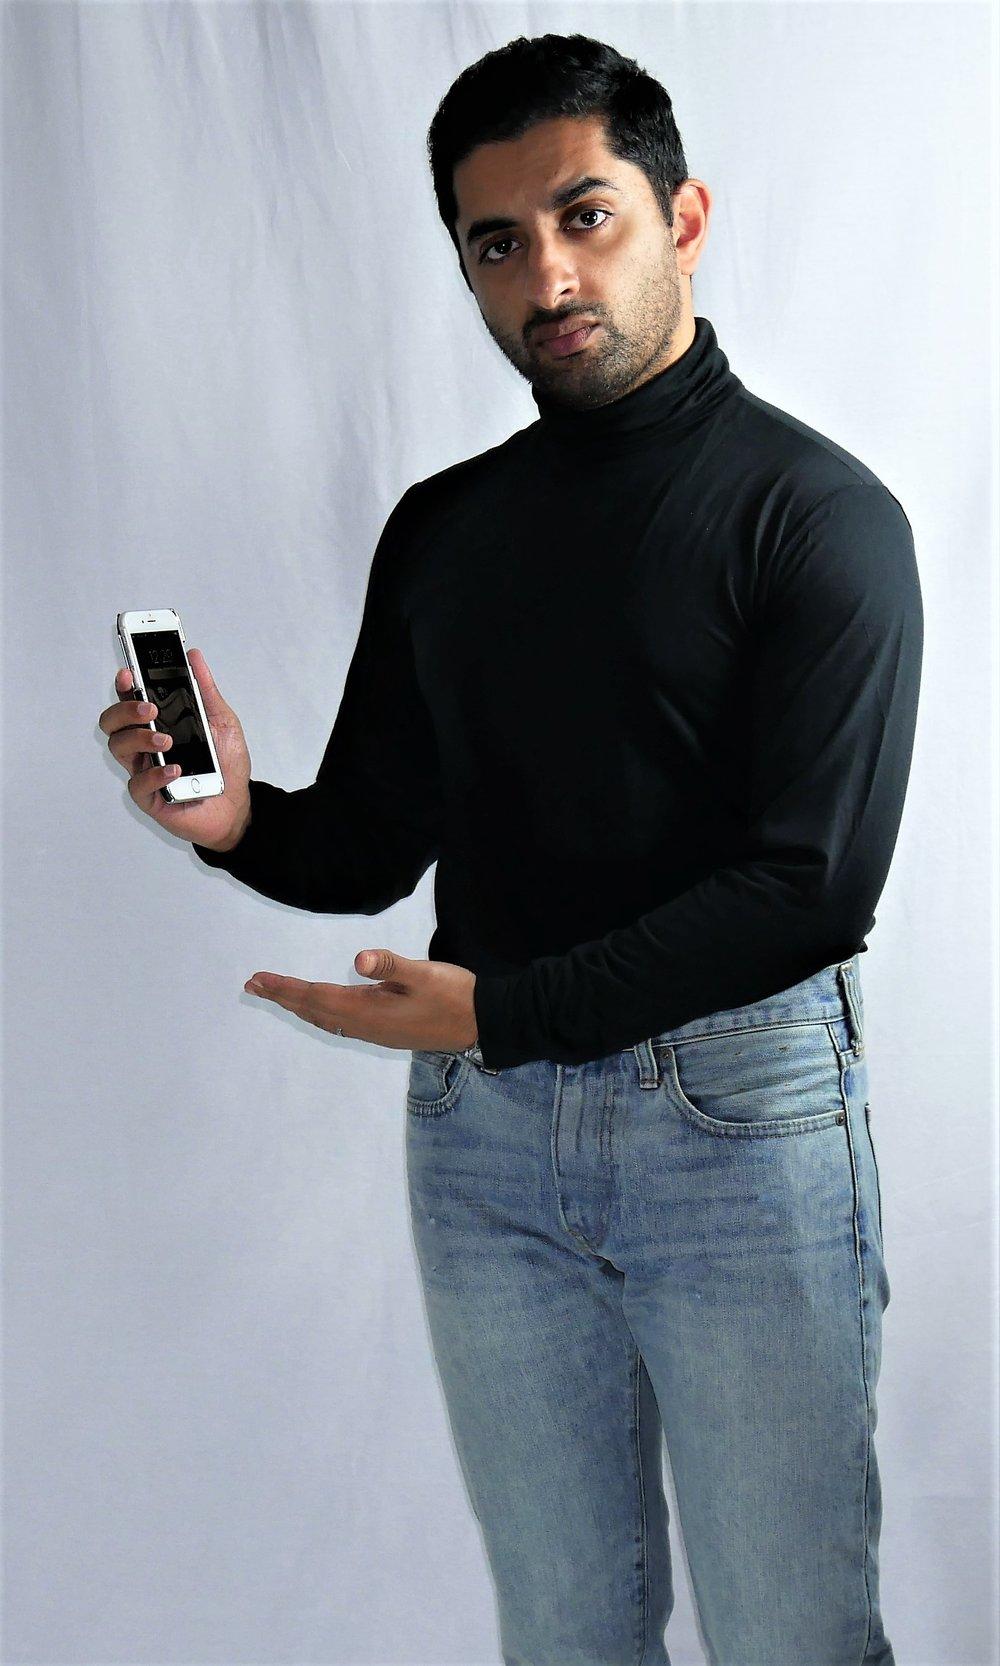 Introducing iPhone 9x